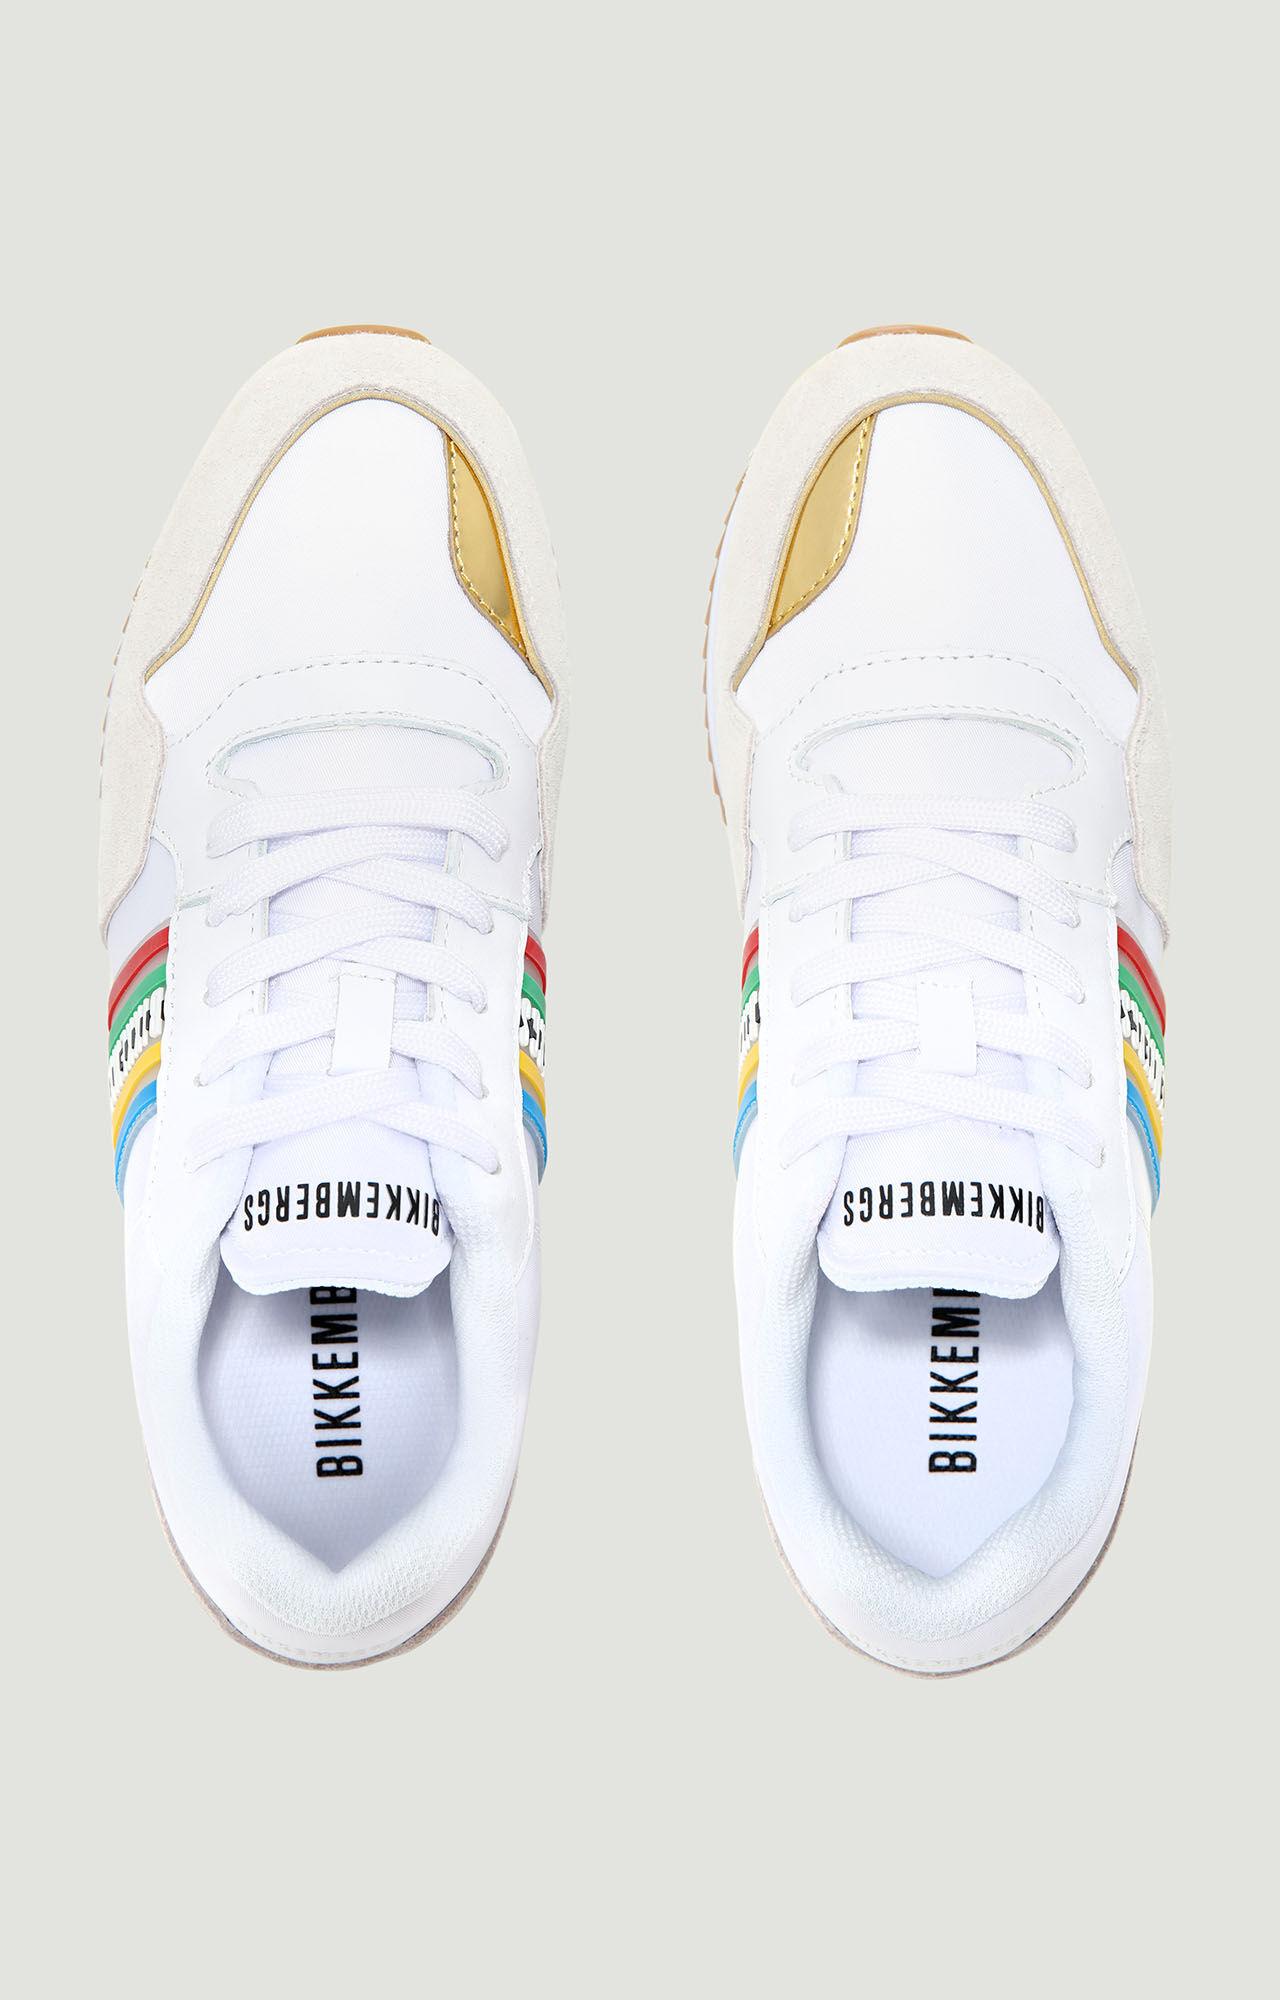 Women's Sneakers   Dirk Bikkembergs